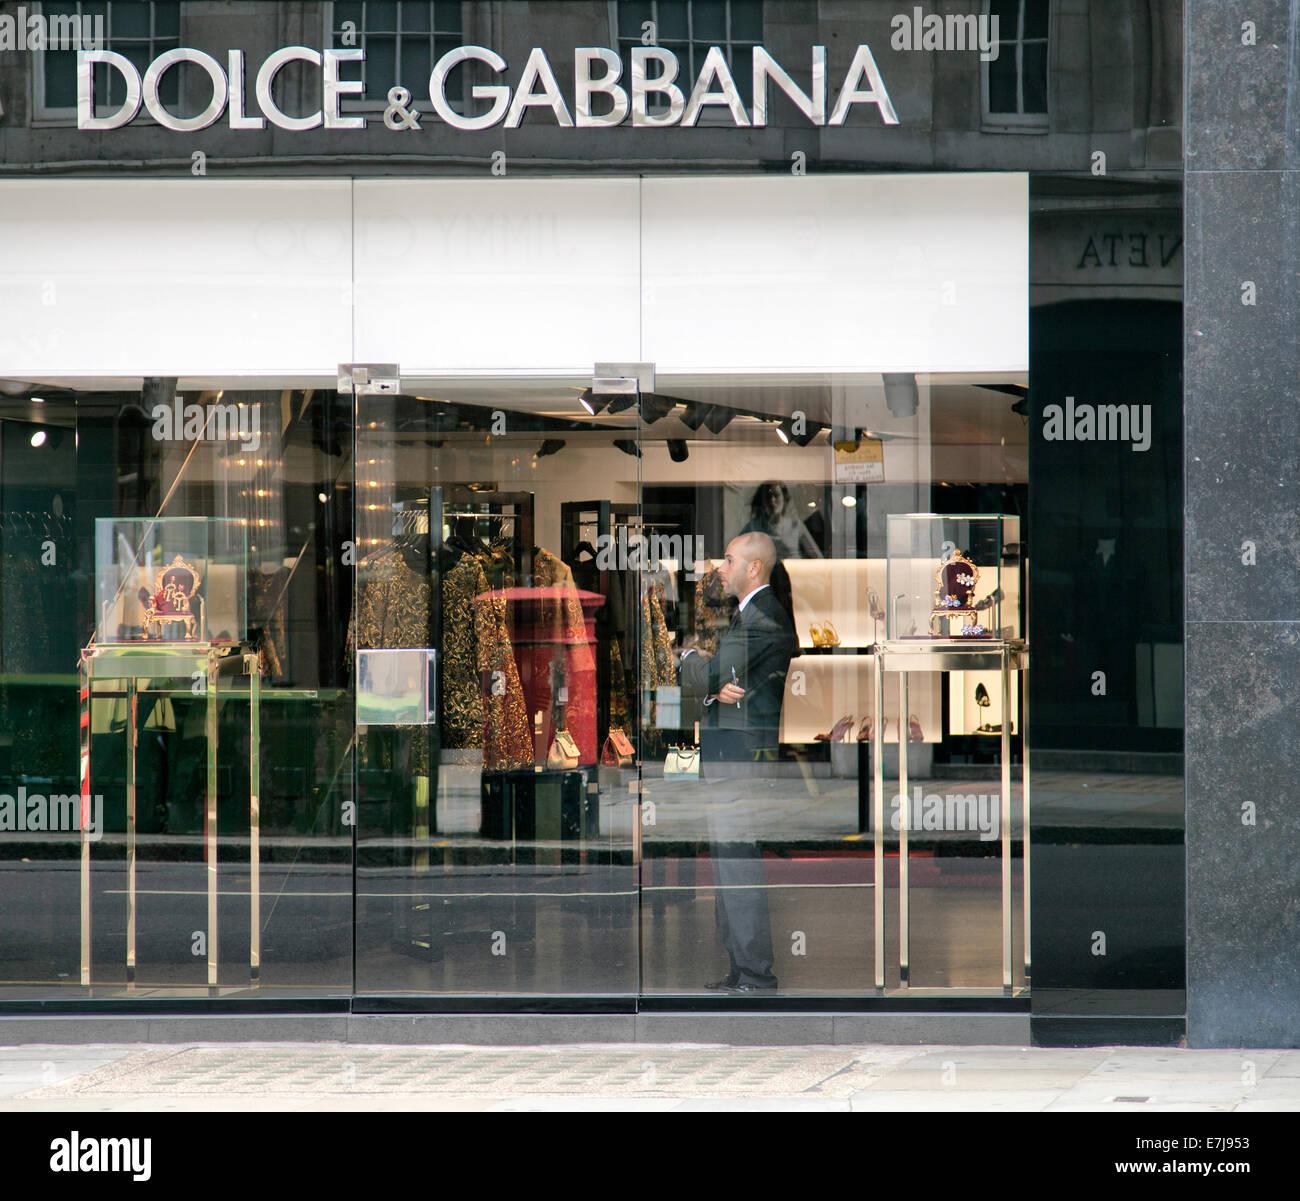 Dolce & Gabbana Store on Sloane Street in Knightsbridge - London UK - Stock Image